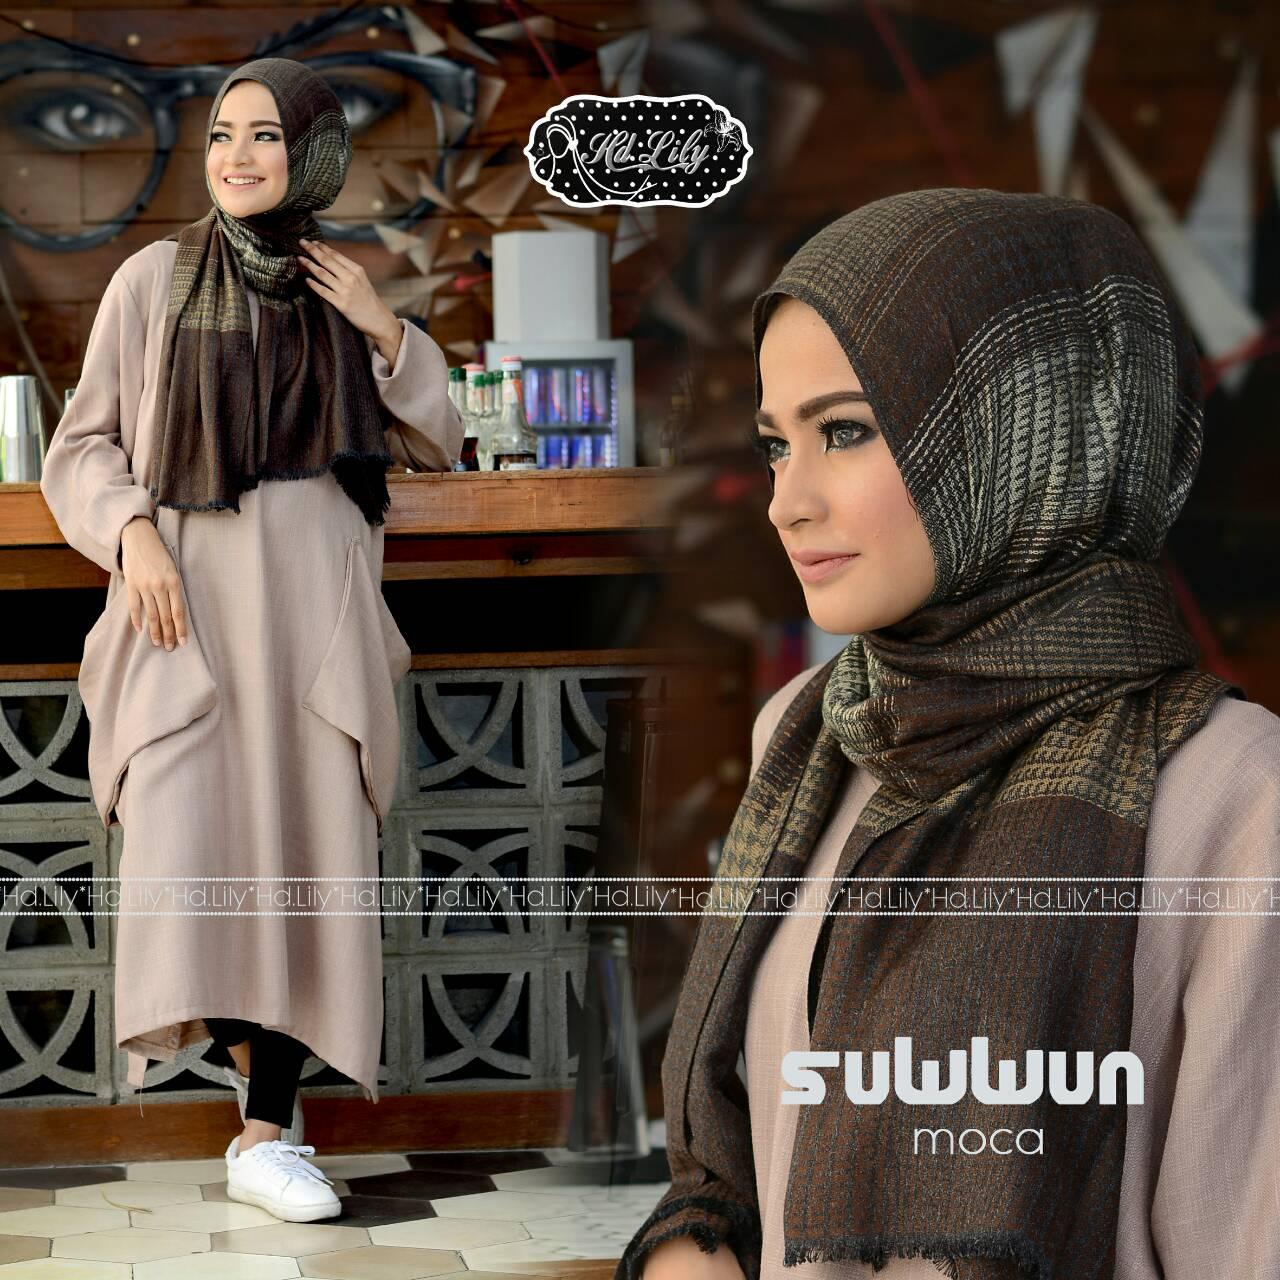 Jual Baju Hijab Laudya Chintya Bella Suwwun Set By Hody Lily